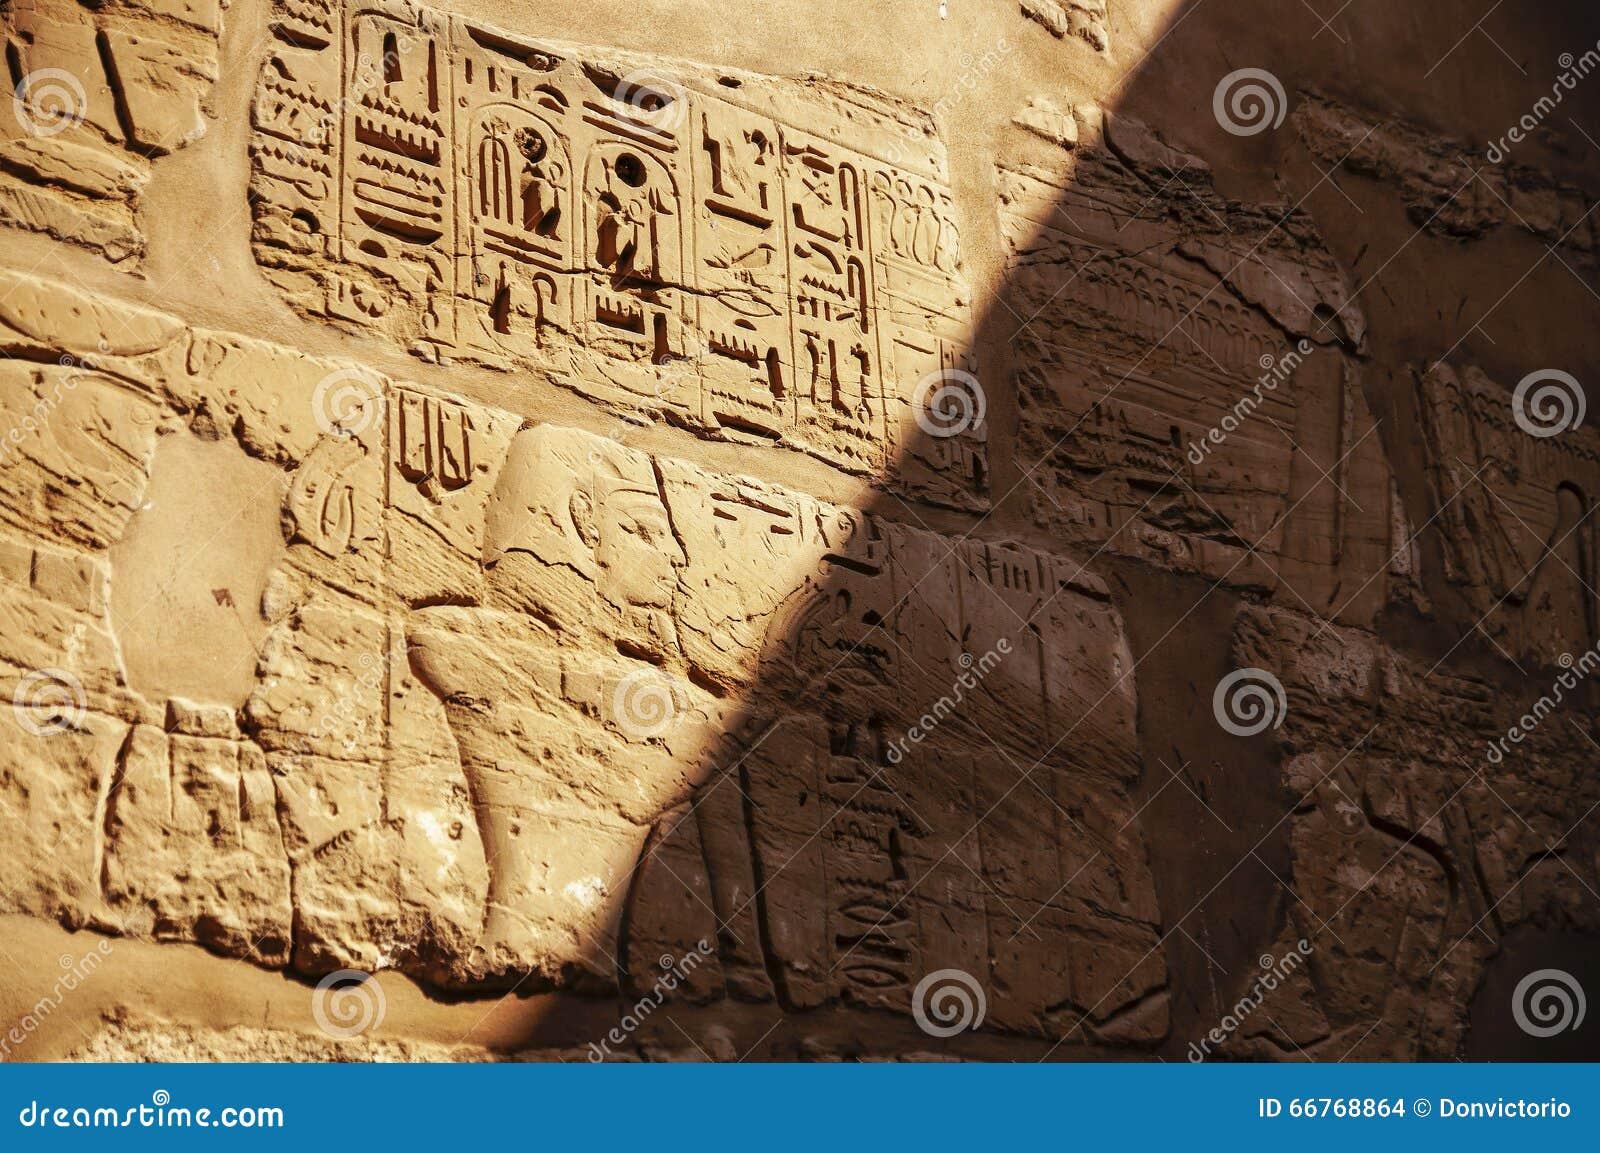 Hieroglyphs on the wall egypt pyramids stock photo